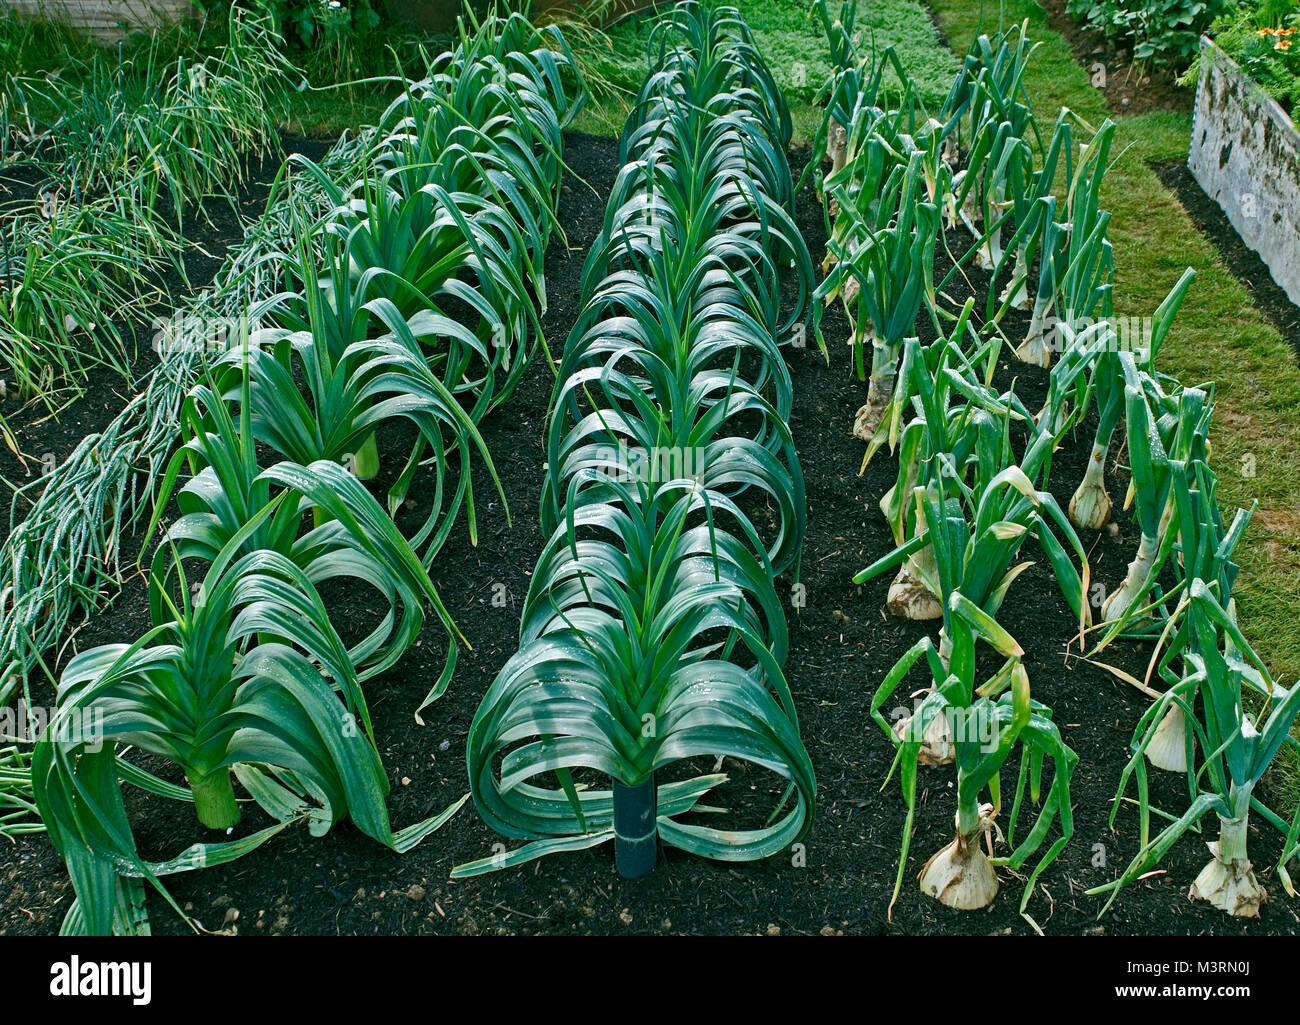 Rows of leeks left Pot Leek 'Yorkshire Green' centre Blanch Leek 'Steve's selected' and left - Stock Image